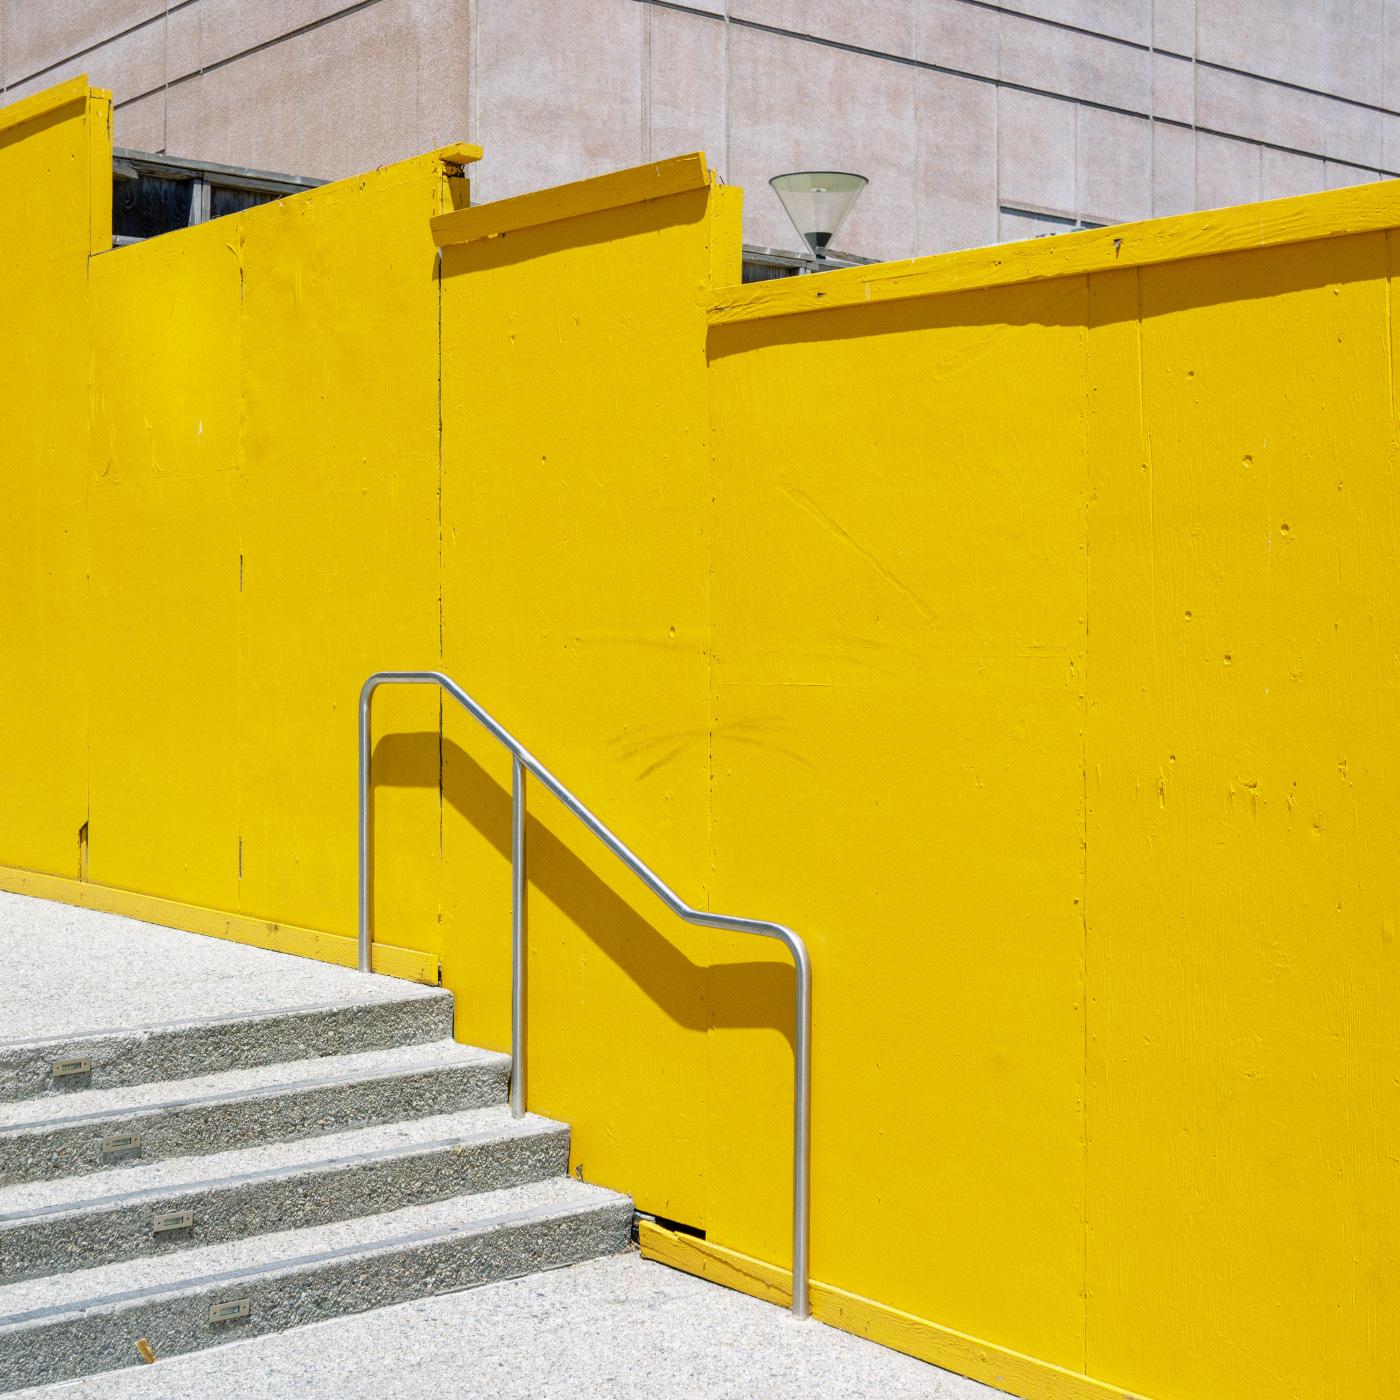 architectural photography architecture colour photography fine art Las Vegas new topographics san francisco seoul Urban city